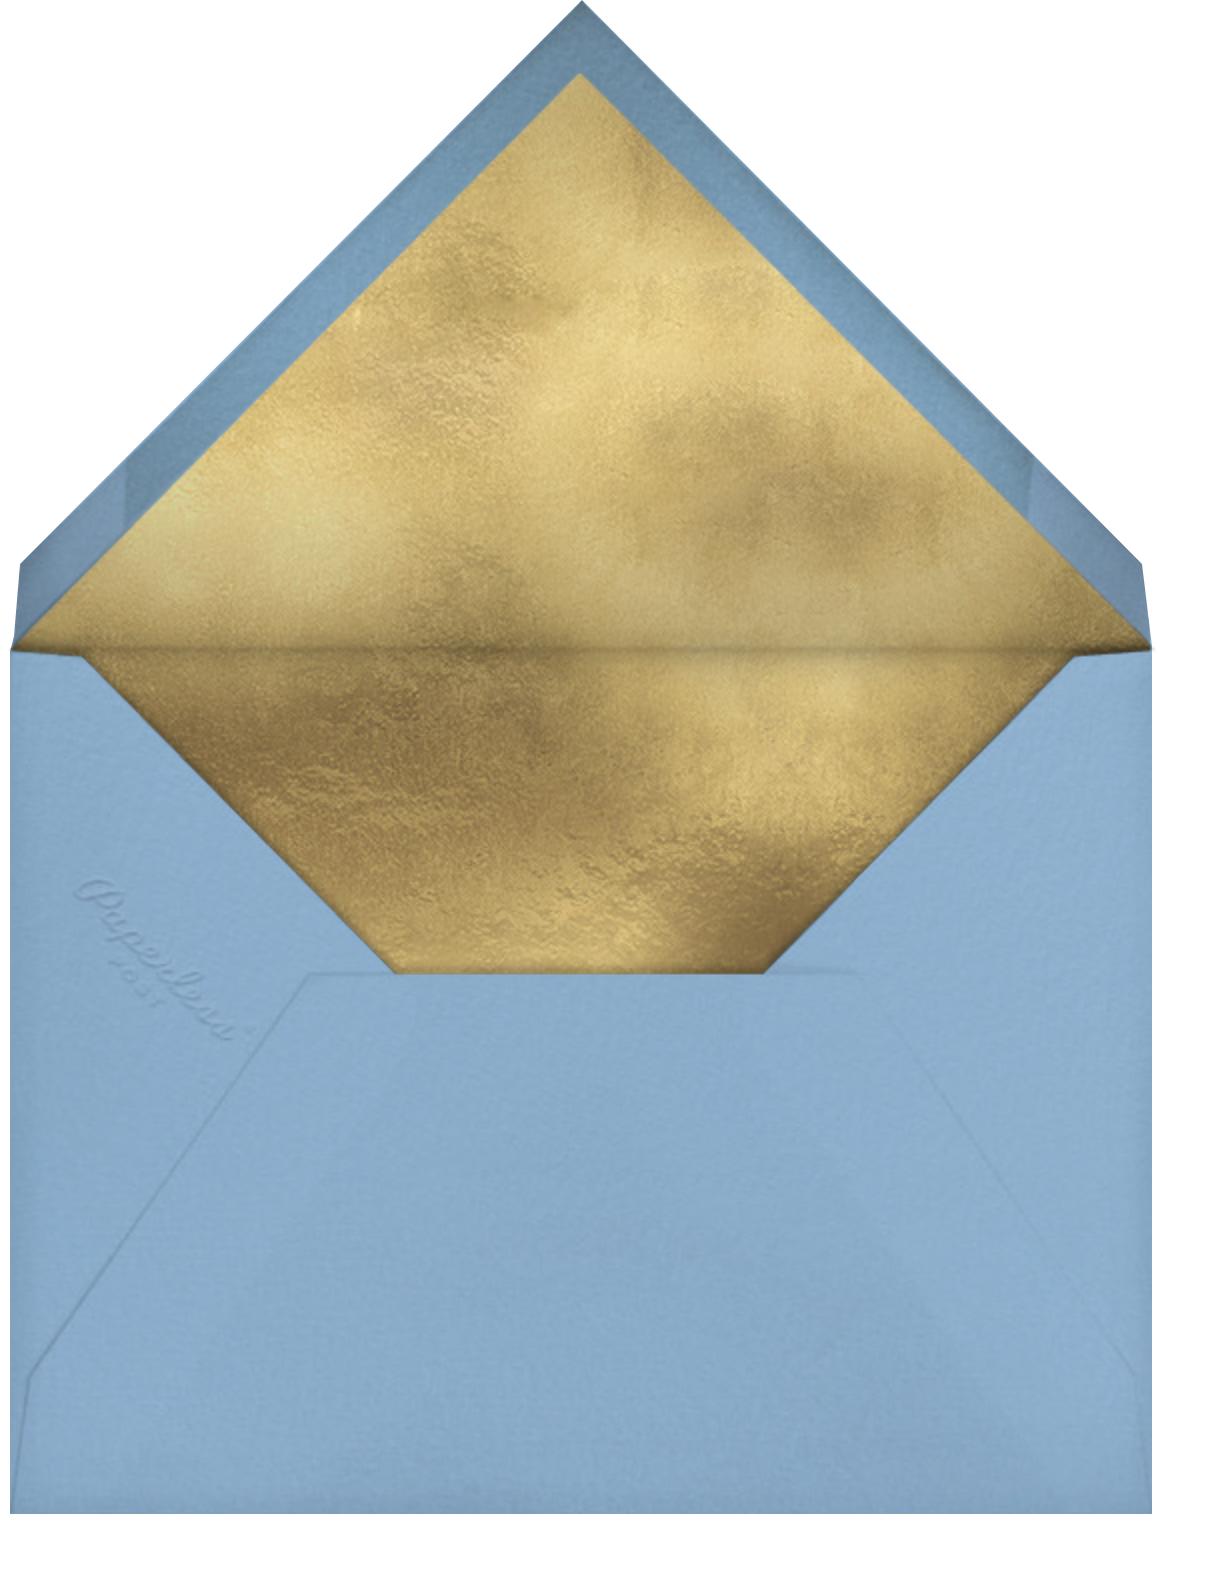 Easy Breezy (Kate Pugsley) - Medium/Tan - Red Cap Cards - Valentine's Day - envelope back